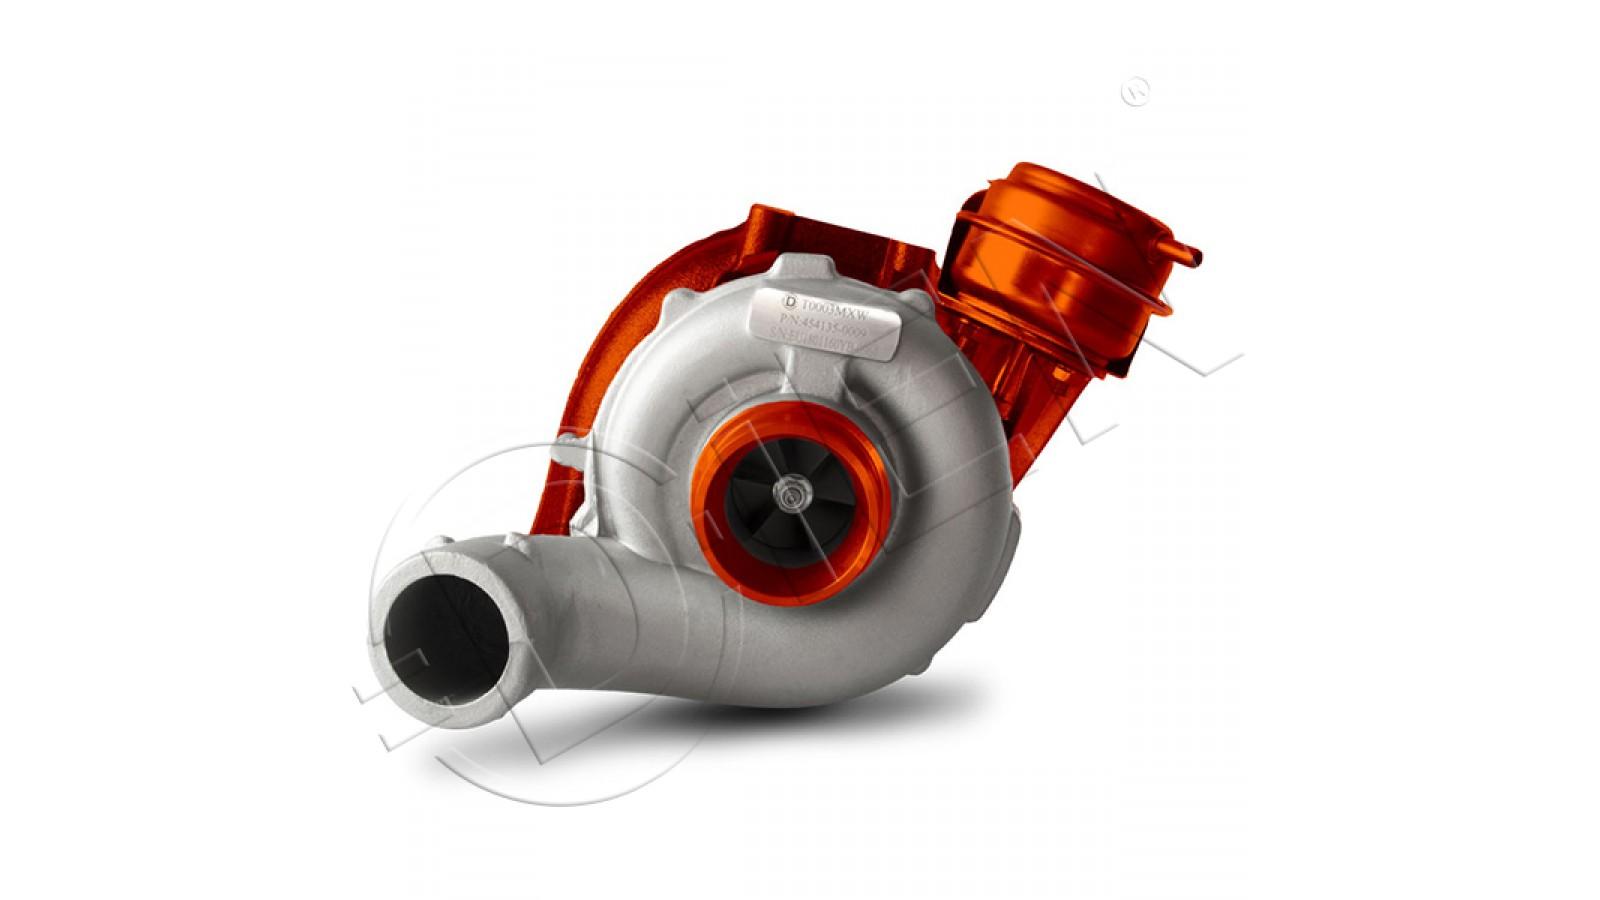 Turbocompressore  VOLVO  S40 I  1.9 T4  200Cv  1855ccm  mag 1997 - lug 2000